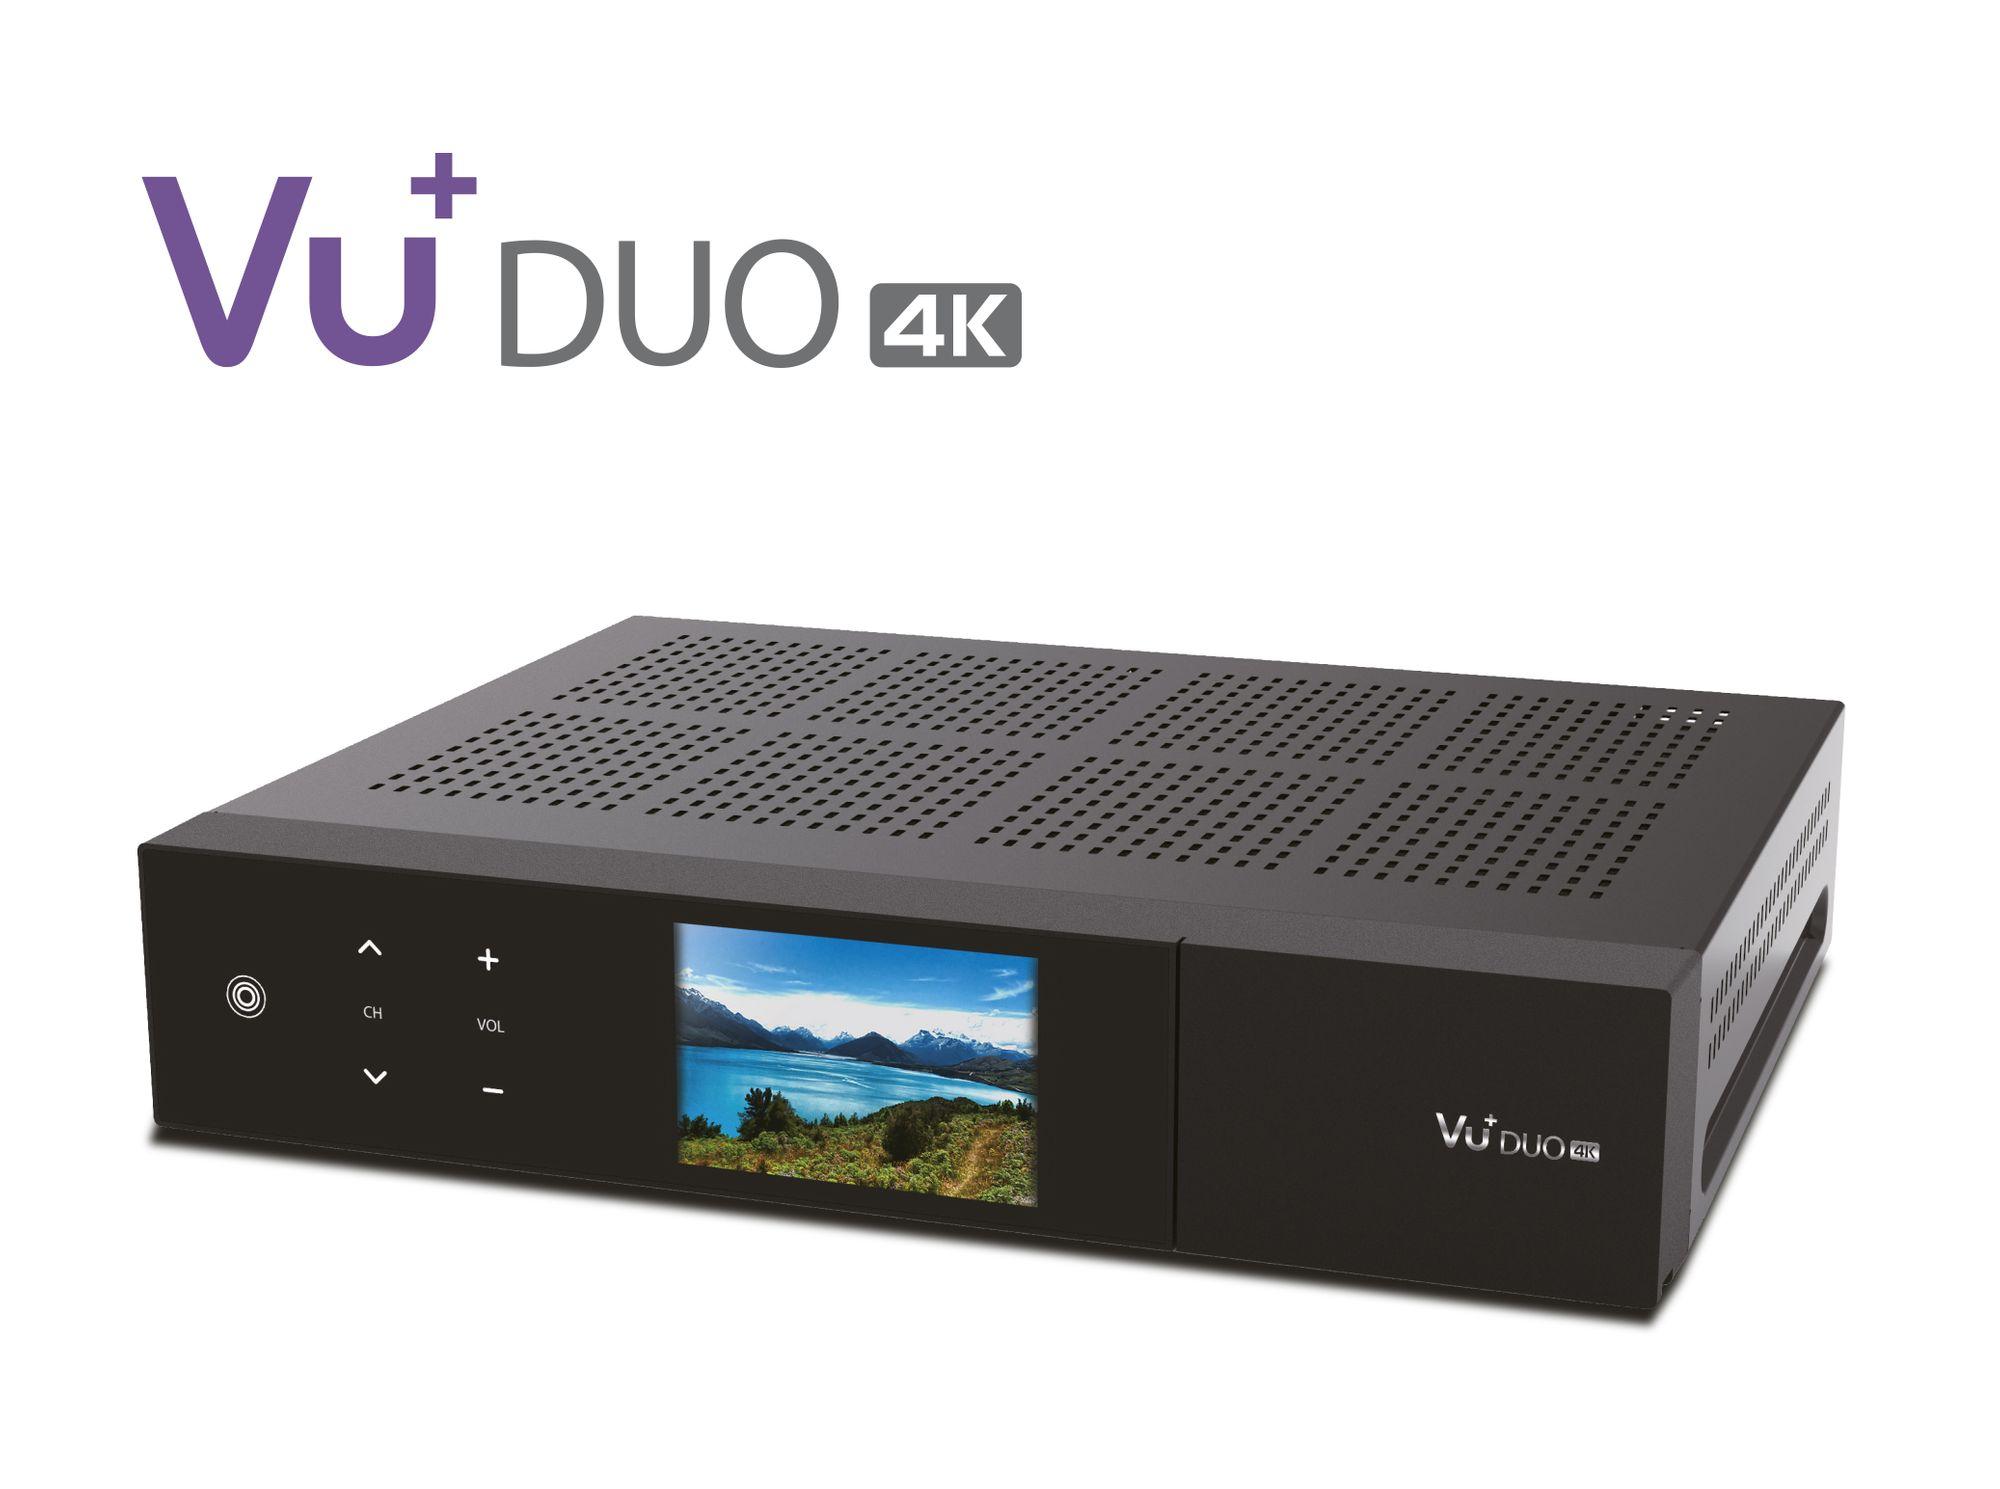 VU+ Duo 4K 1x DVB-S2X FBC Twin Tuner PVR ready Linux Receiver (UHD) 2160p